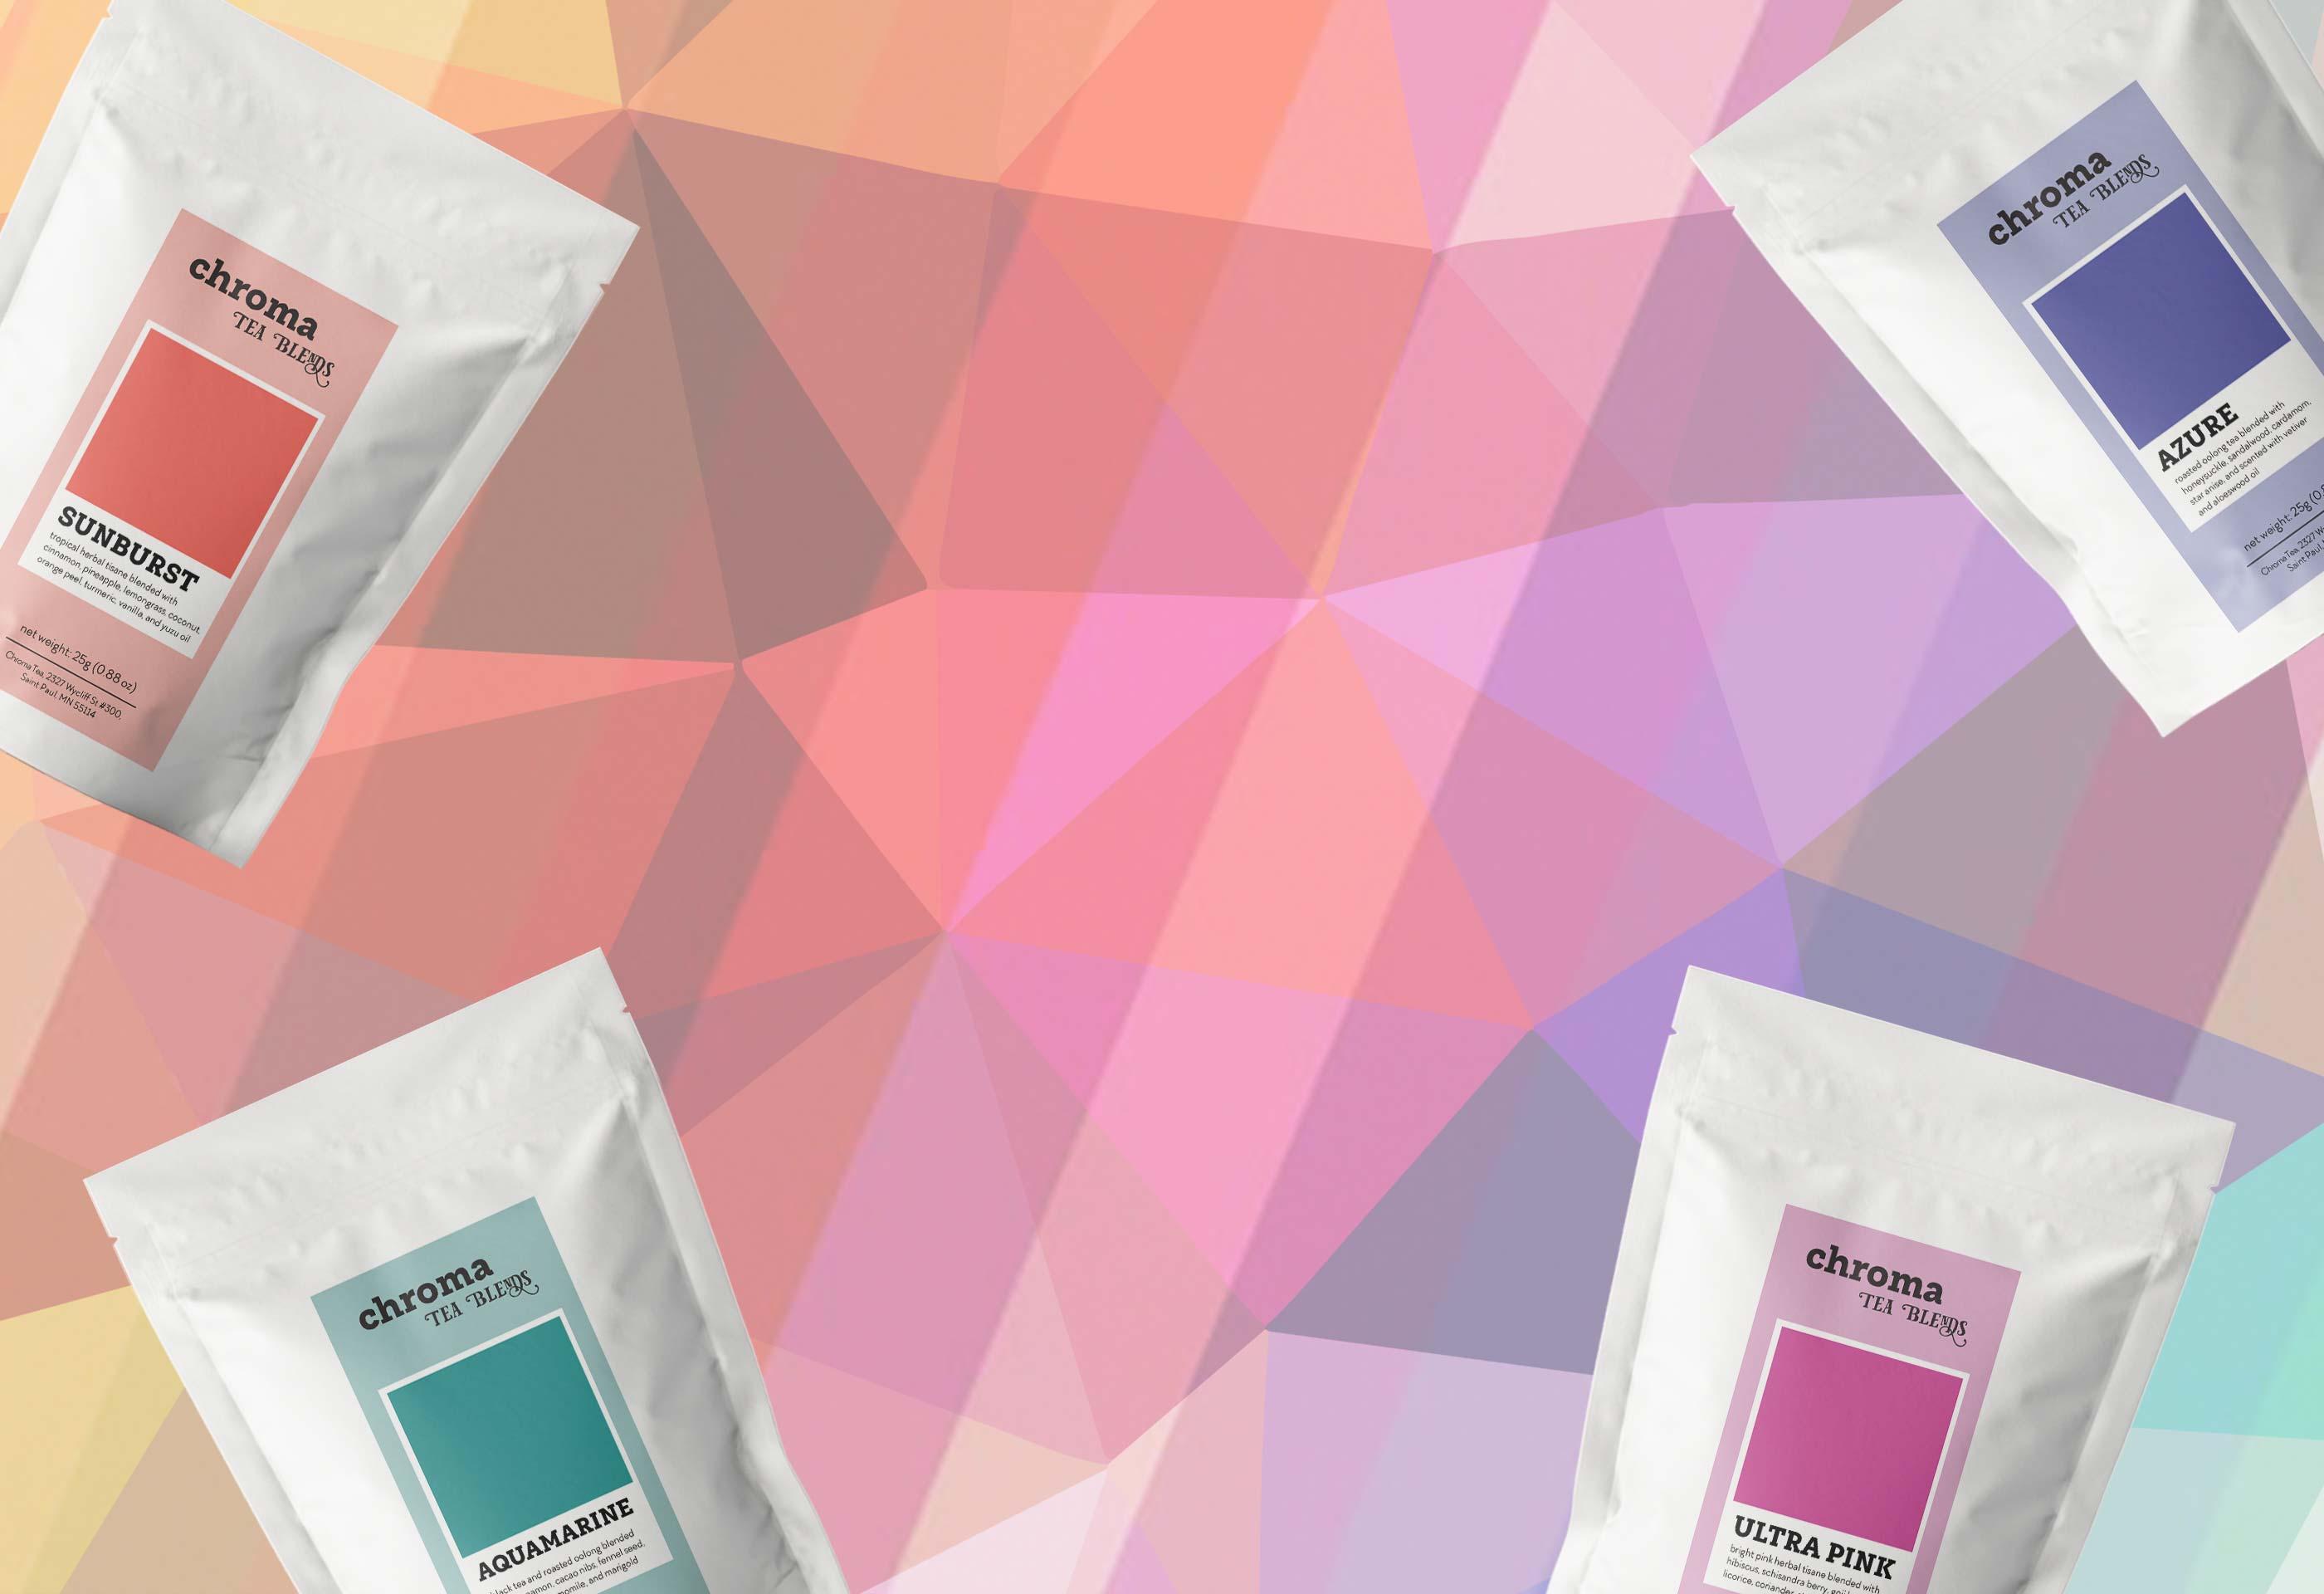 Introducing: Chroma Tea